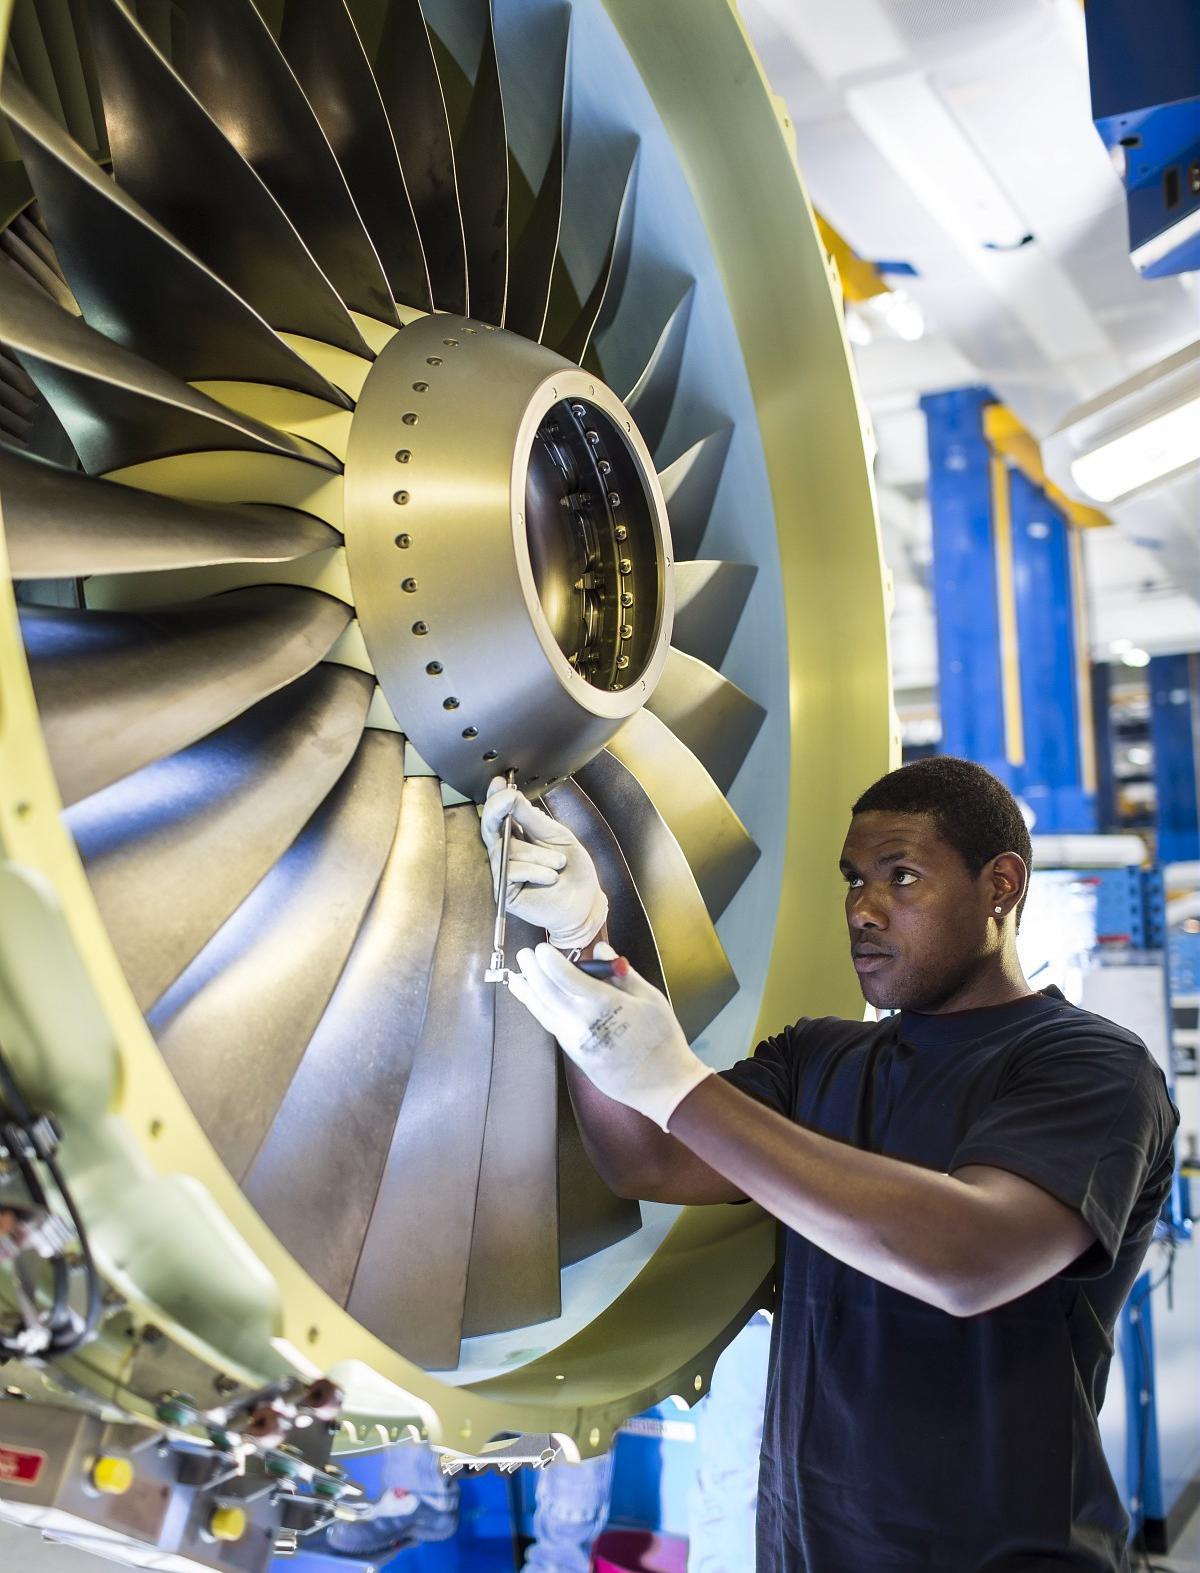 Assembly - CFM56-7B engine